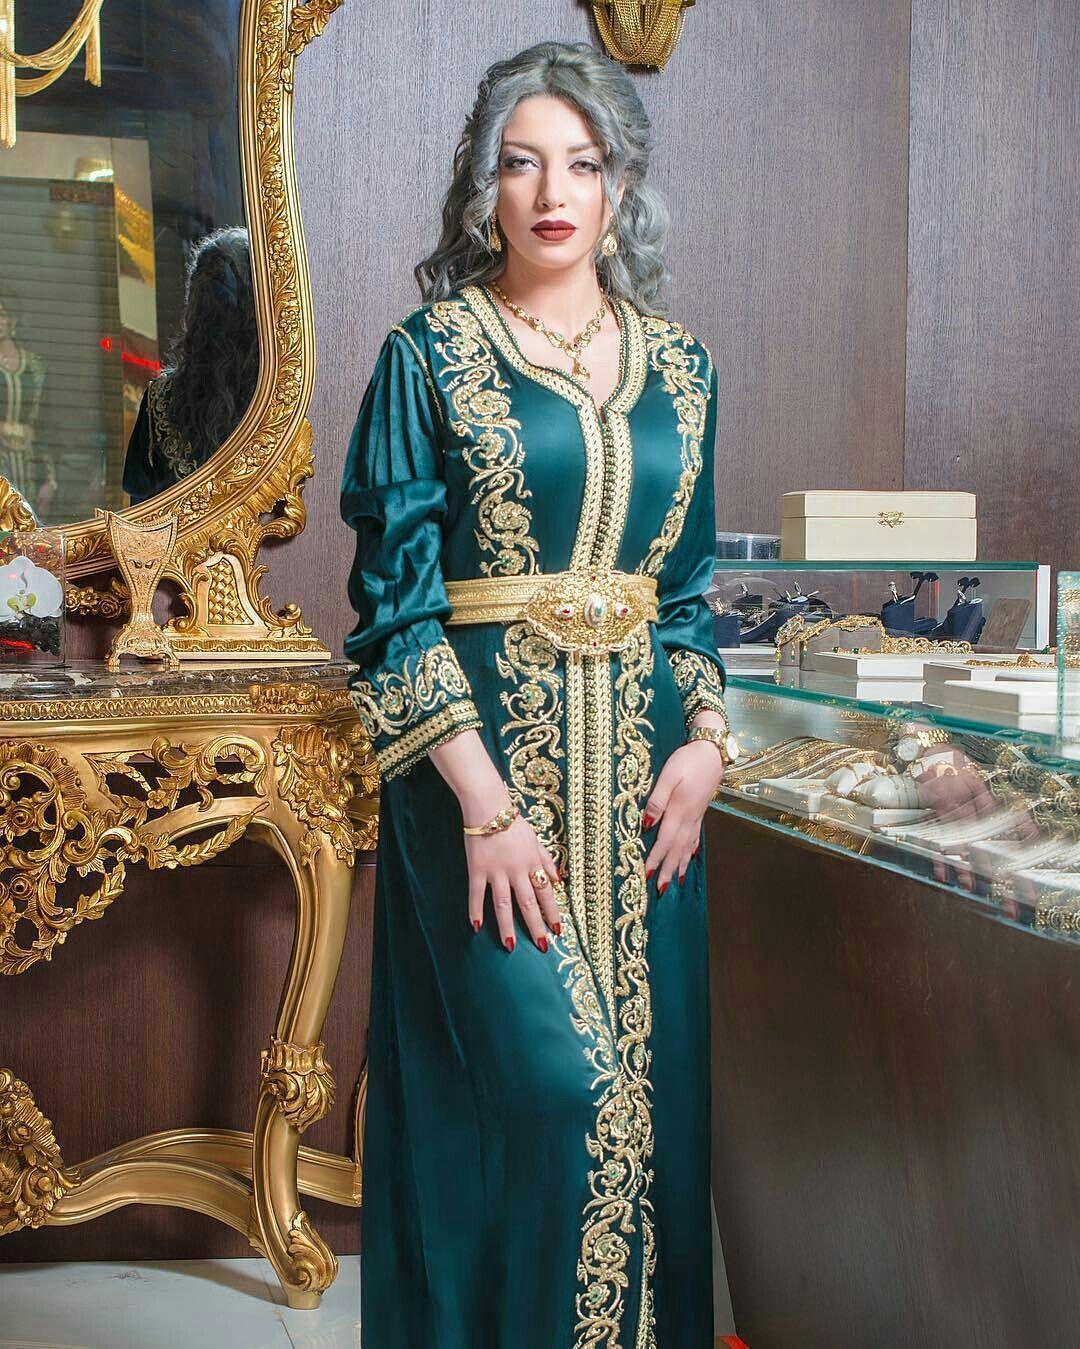 Salon Marocain, Modele Caftan, Caftan Blanc, Caftan Moderne, Broderie  Marocaine, Robe Marocaine, Stylistes, Djellaba, Tenue Traditionnelle